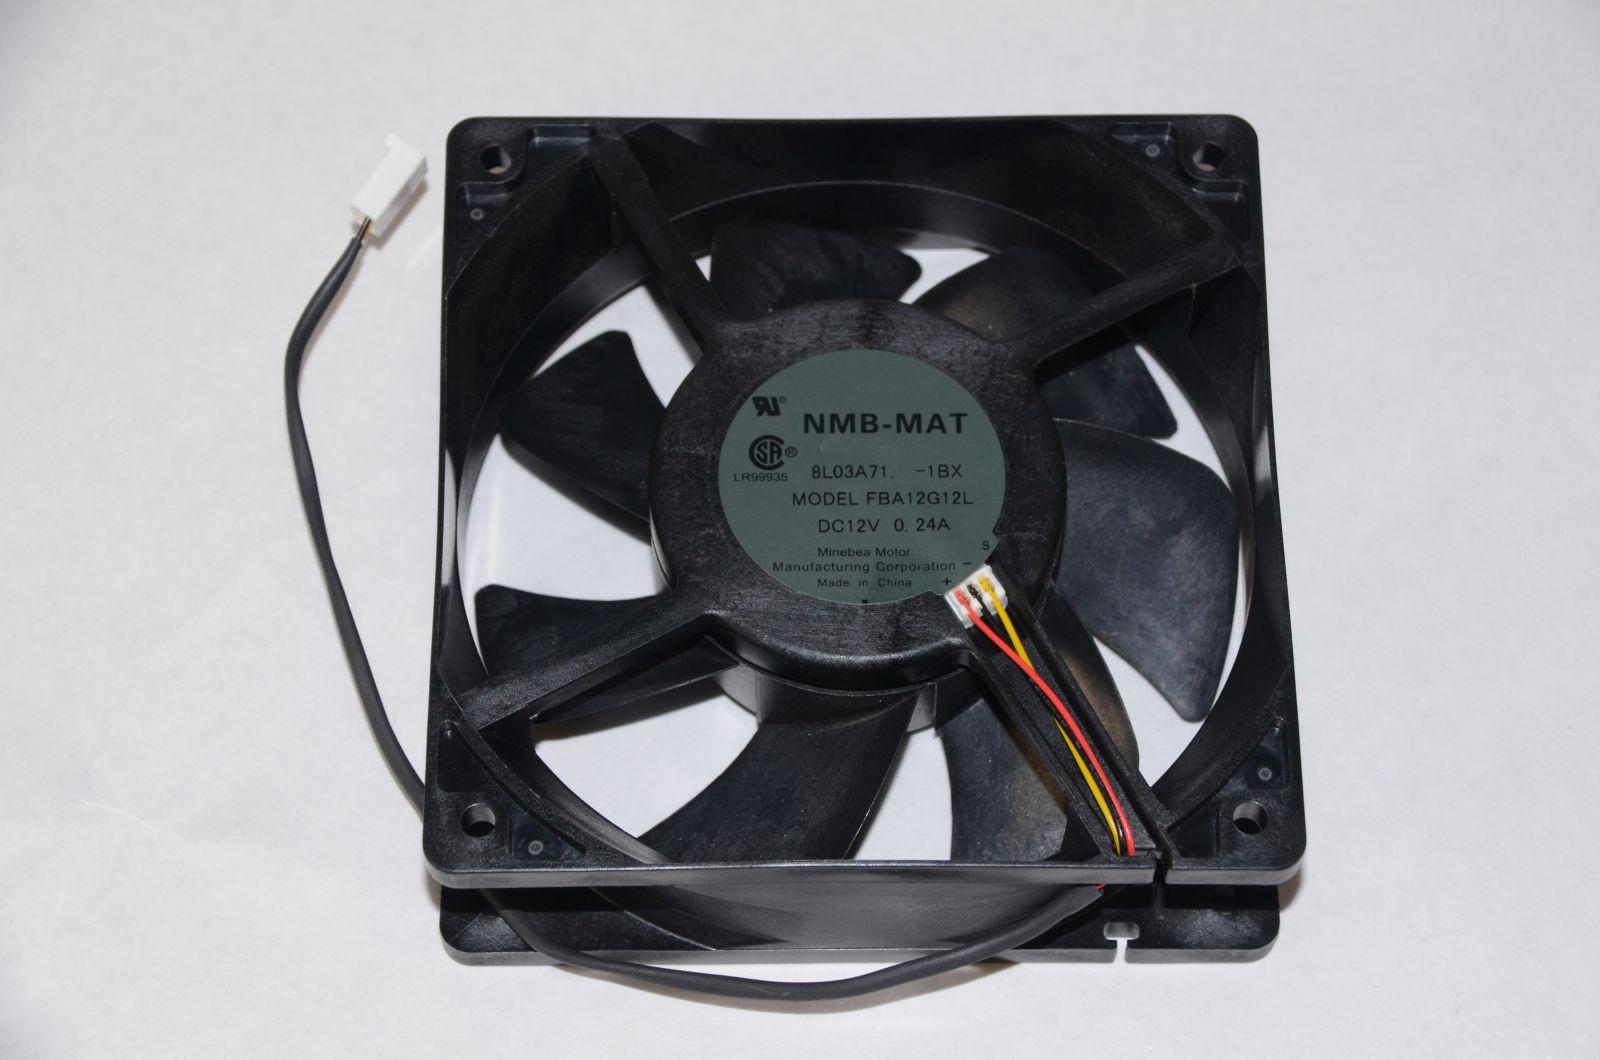 minebea accessories cooling ltd co mat amazon uk computers mats nmb dp dc fan